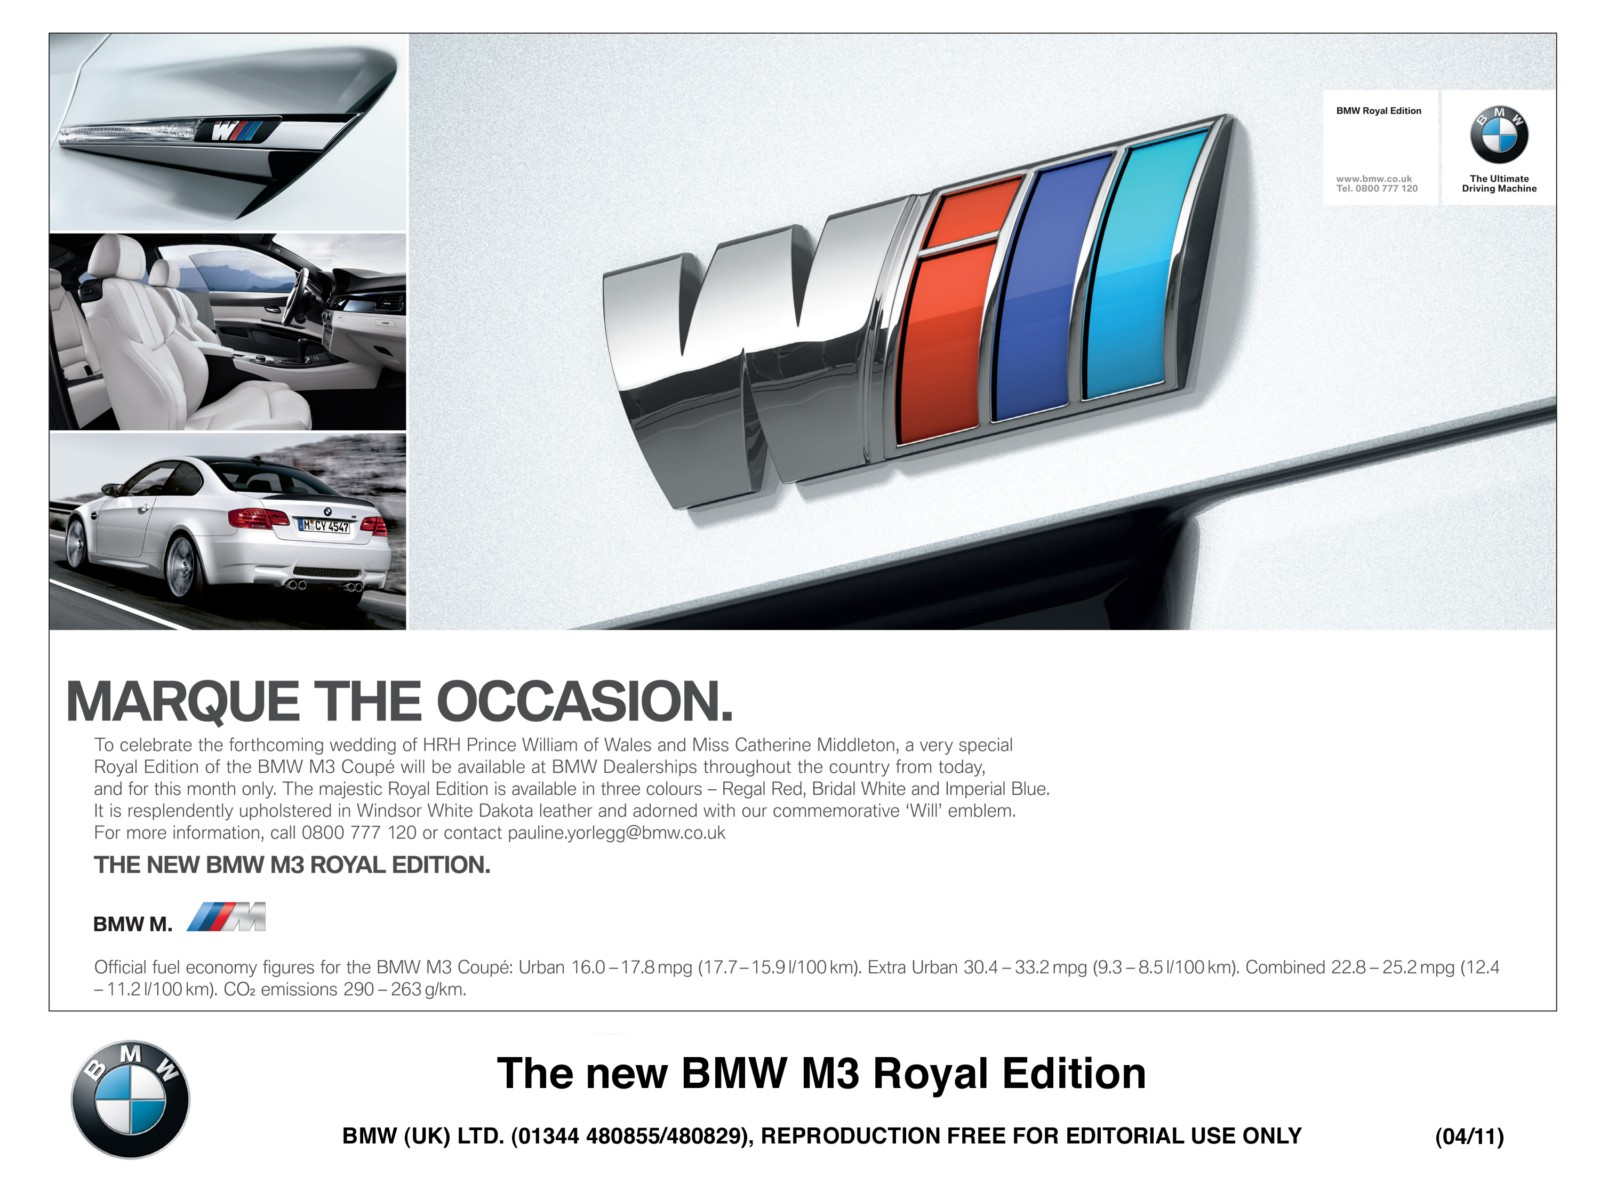 bmw m3 royal edition